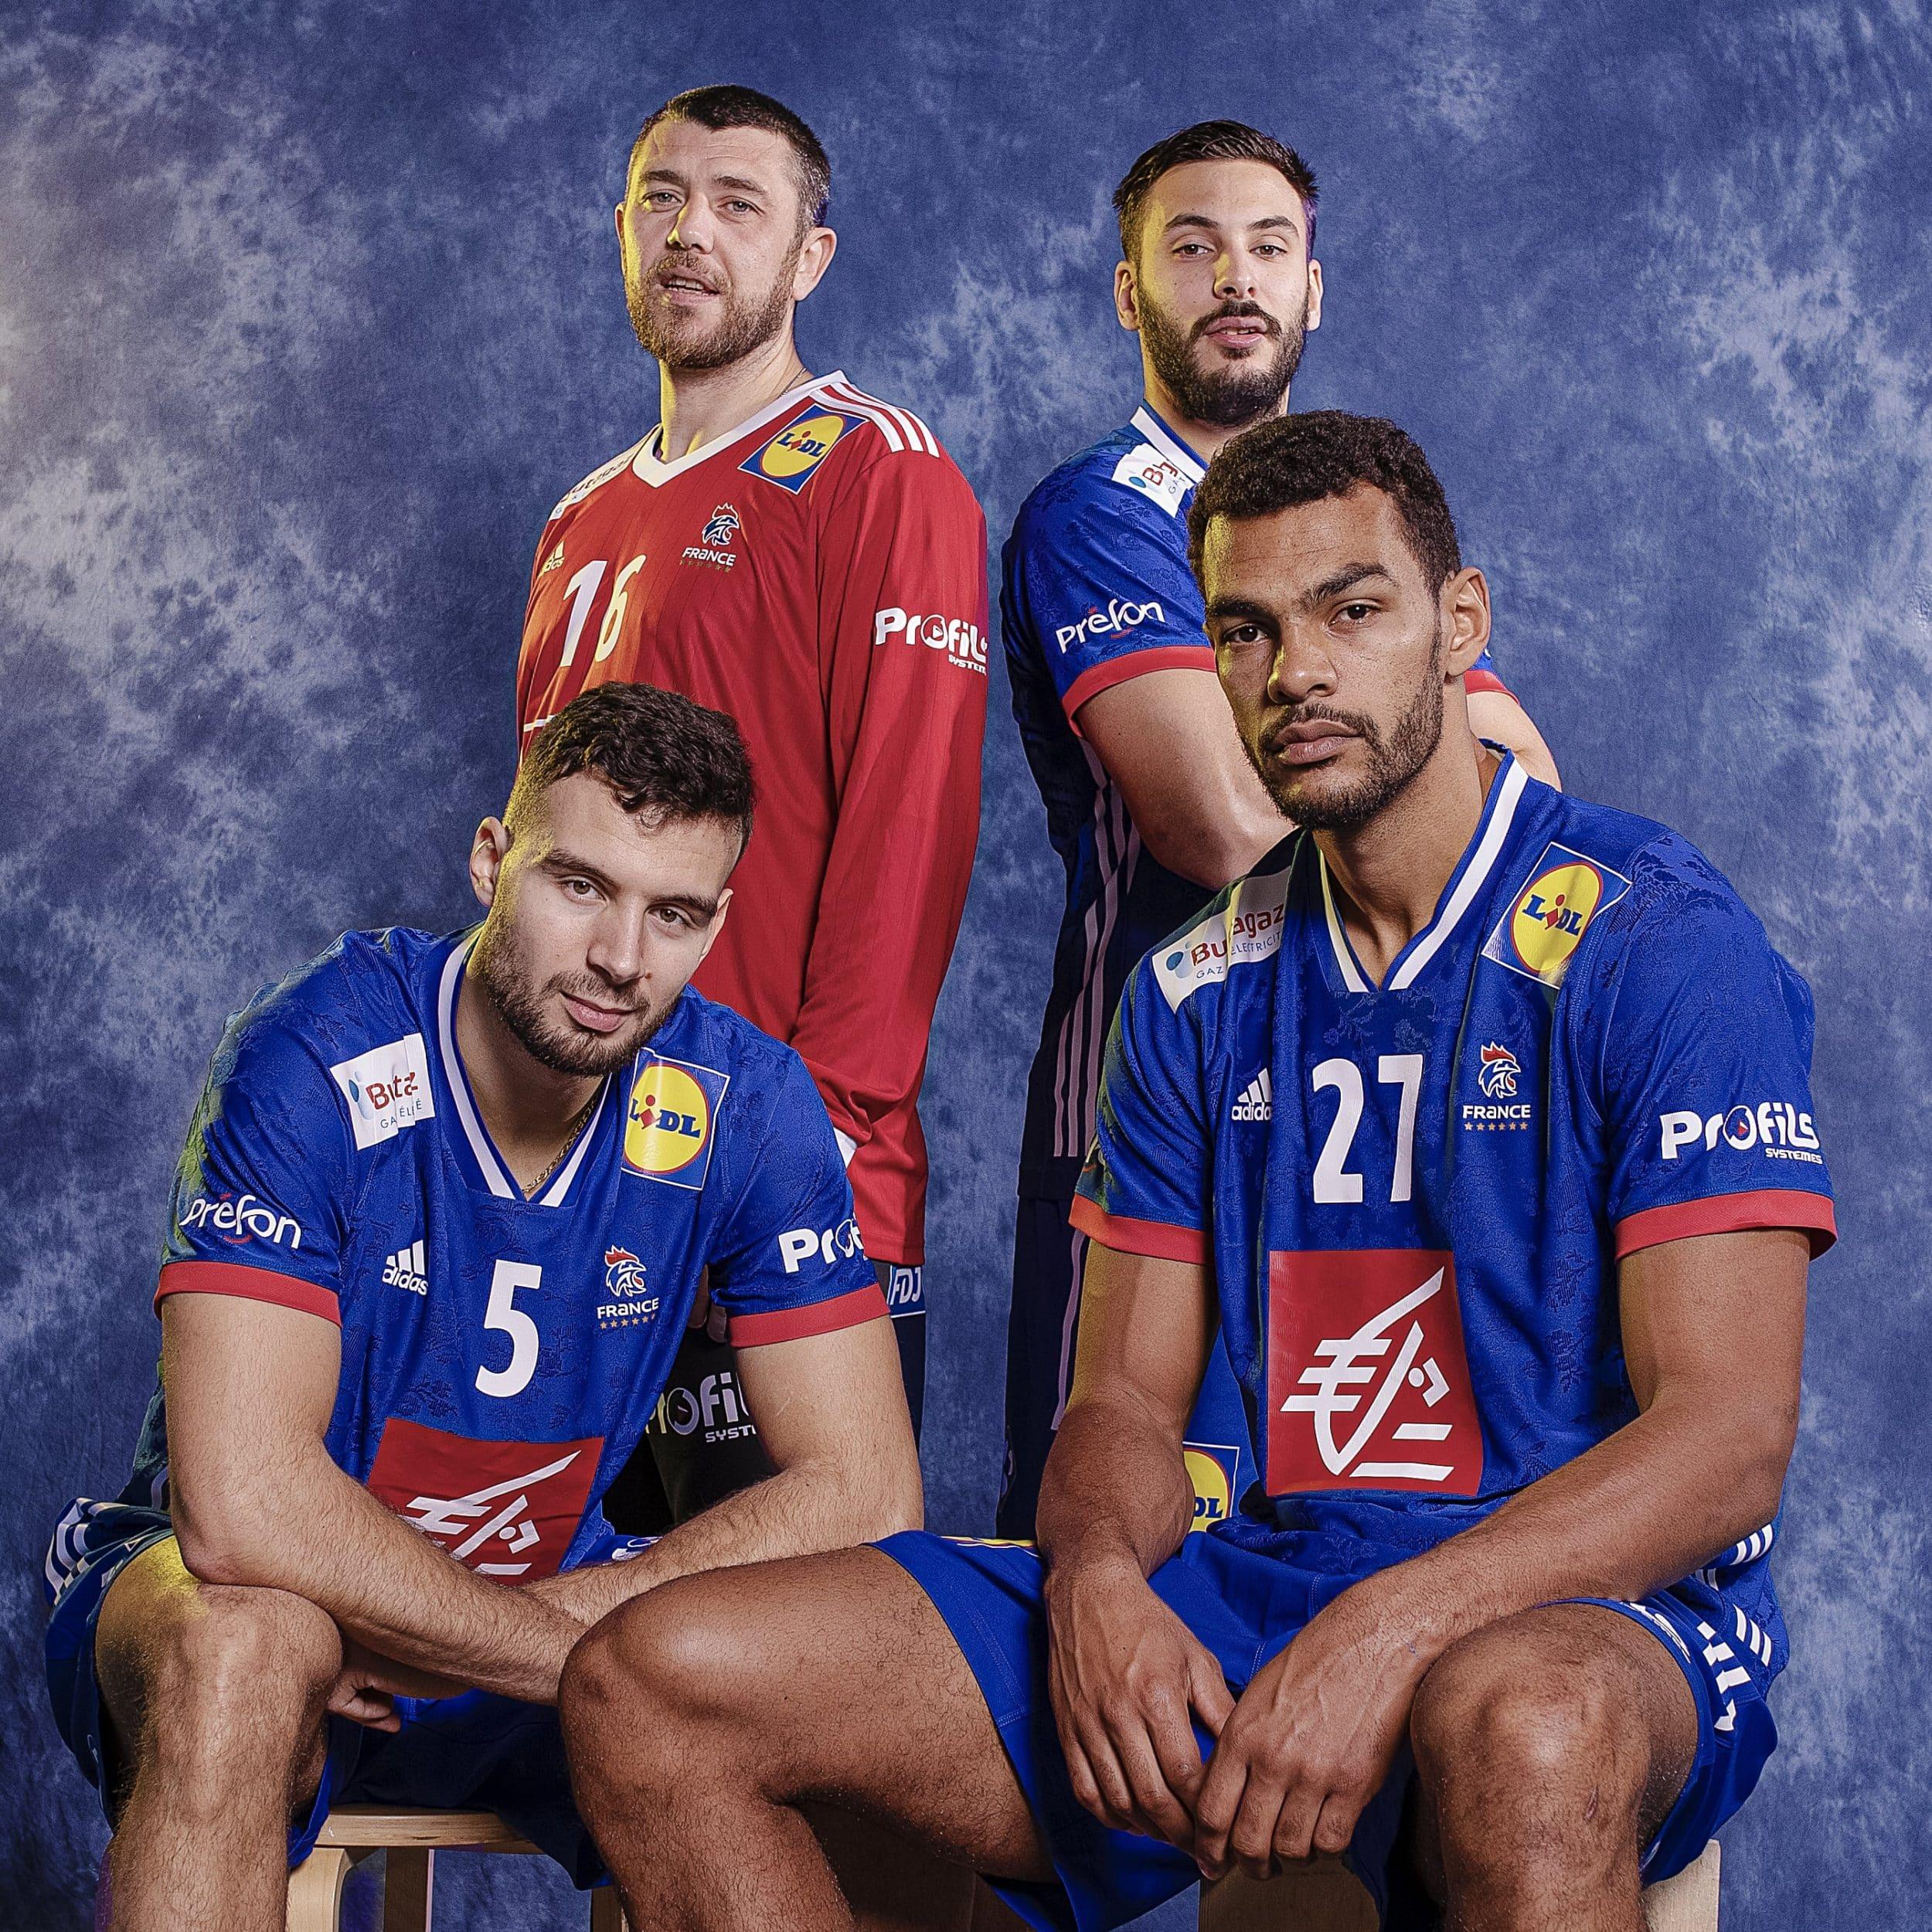 Maillot-équipe-de-france-handball-1